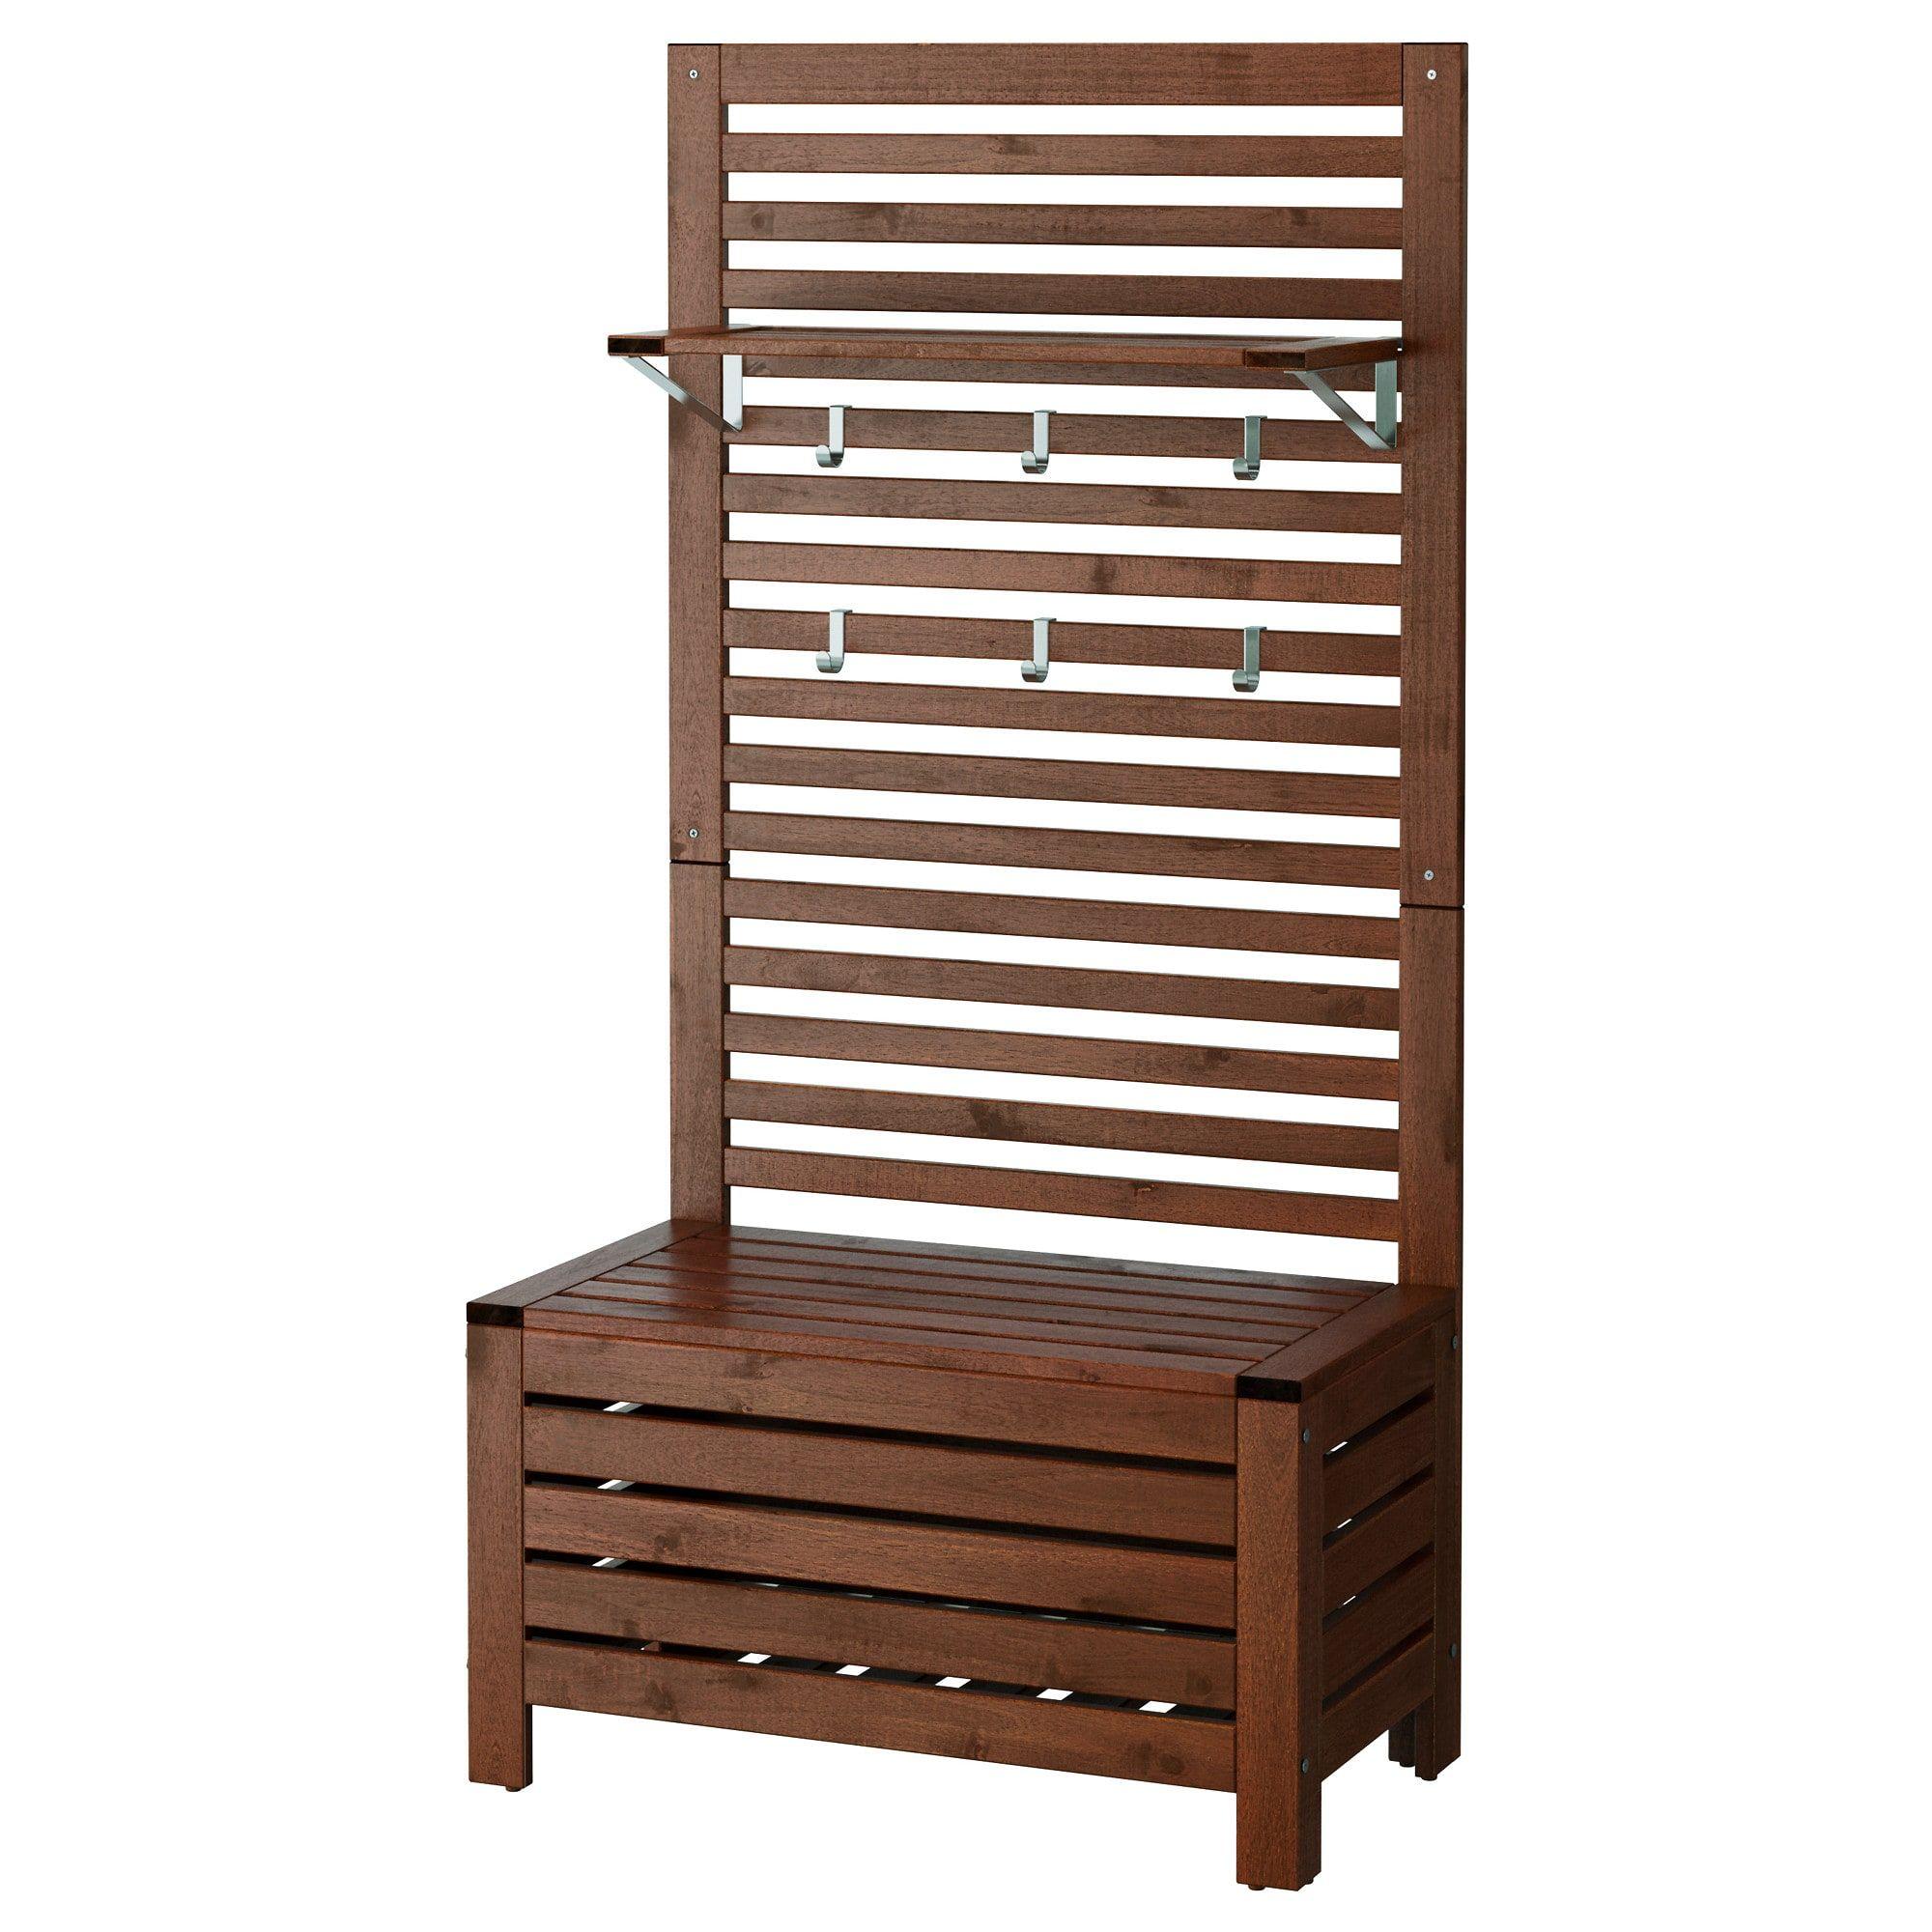 Ikea 196 Pplar 214 Bench W Wall Panel Shelf Outdoor Brown